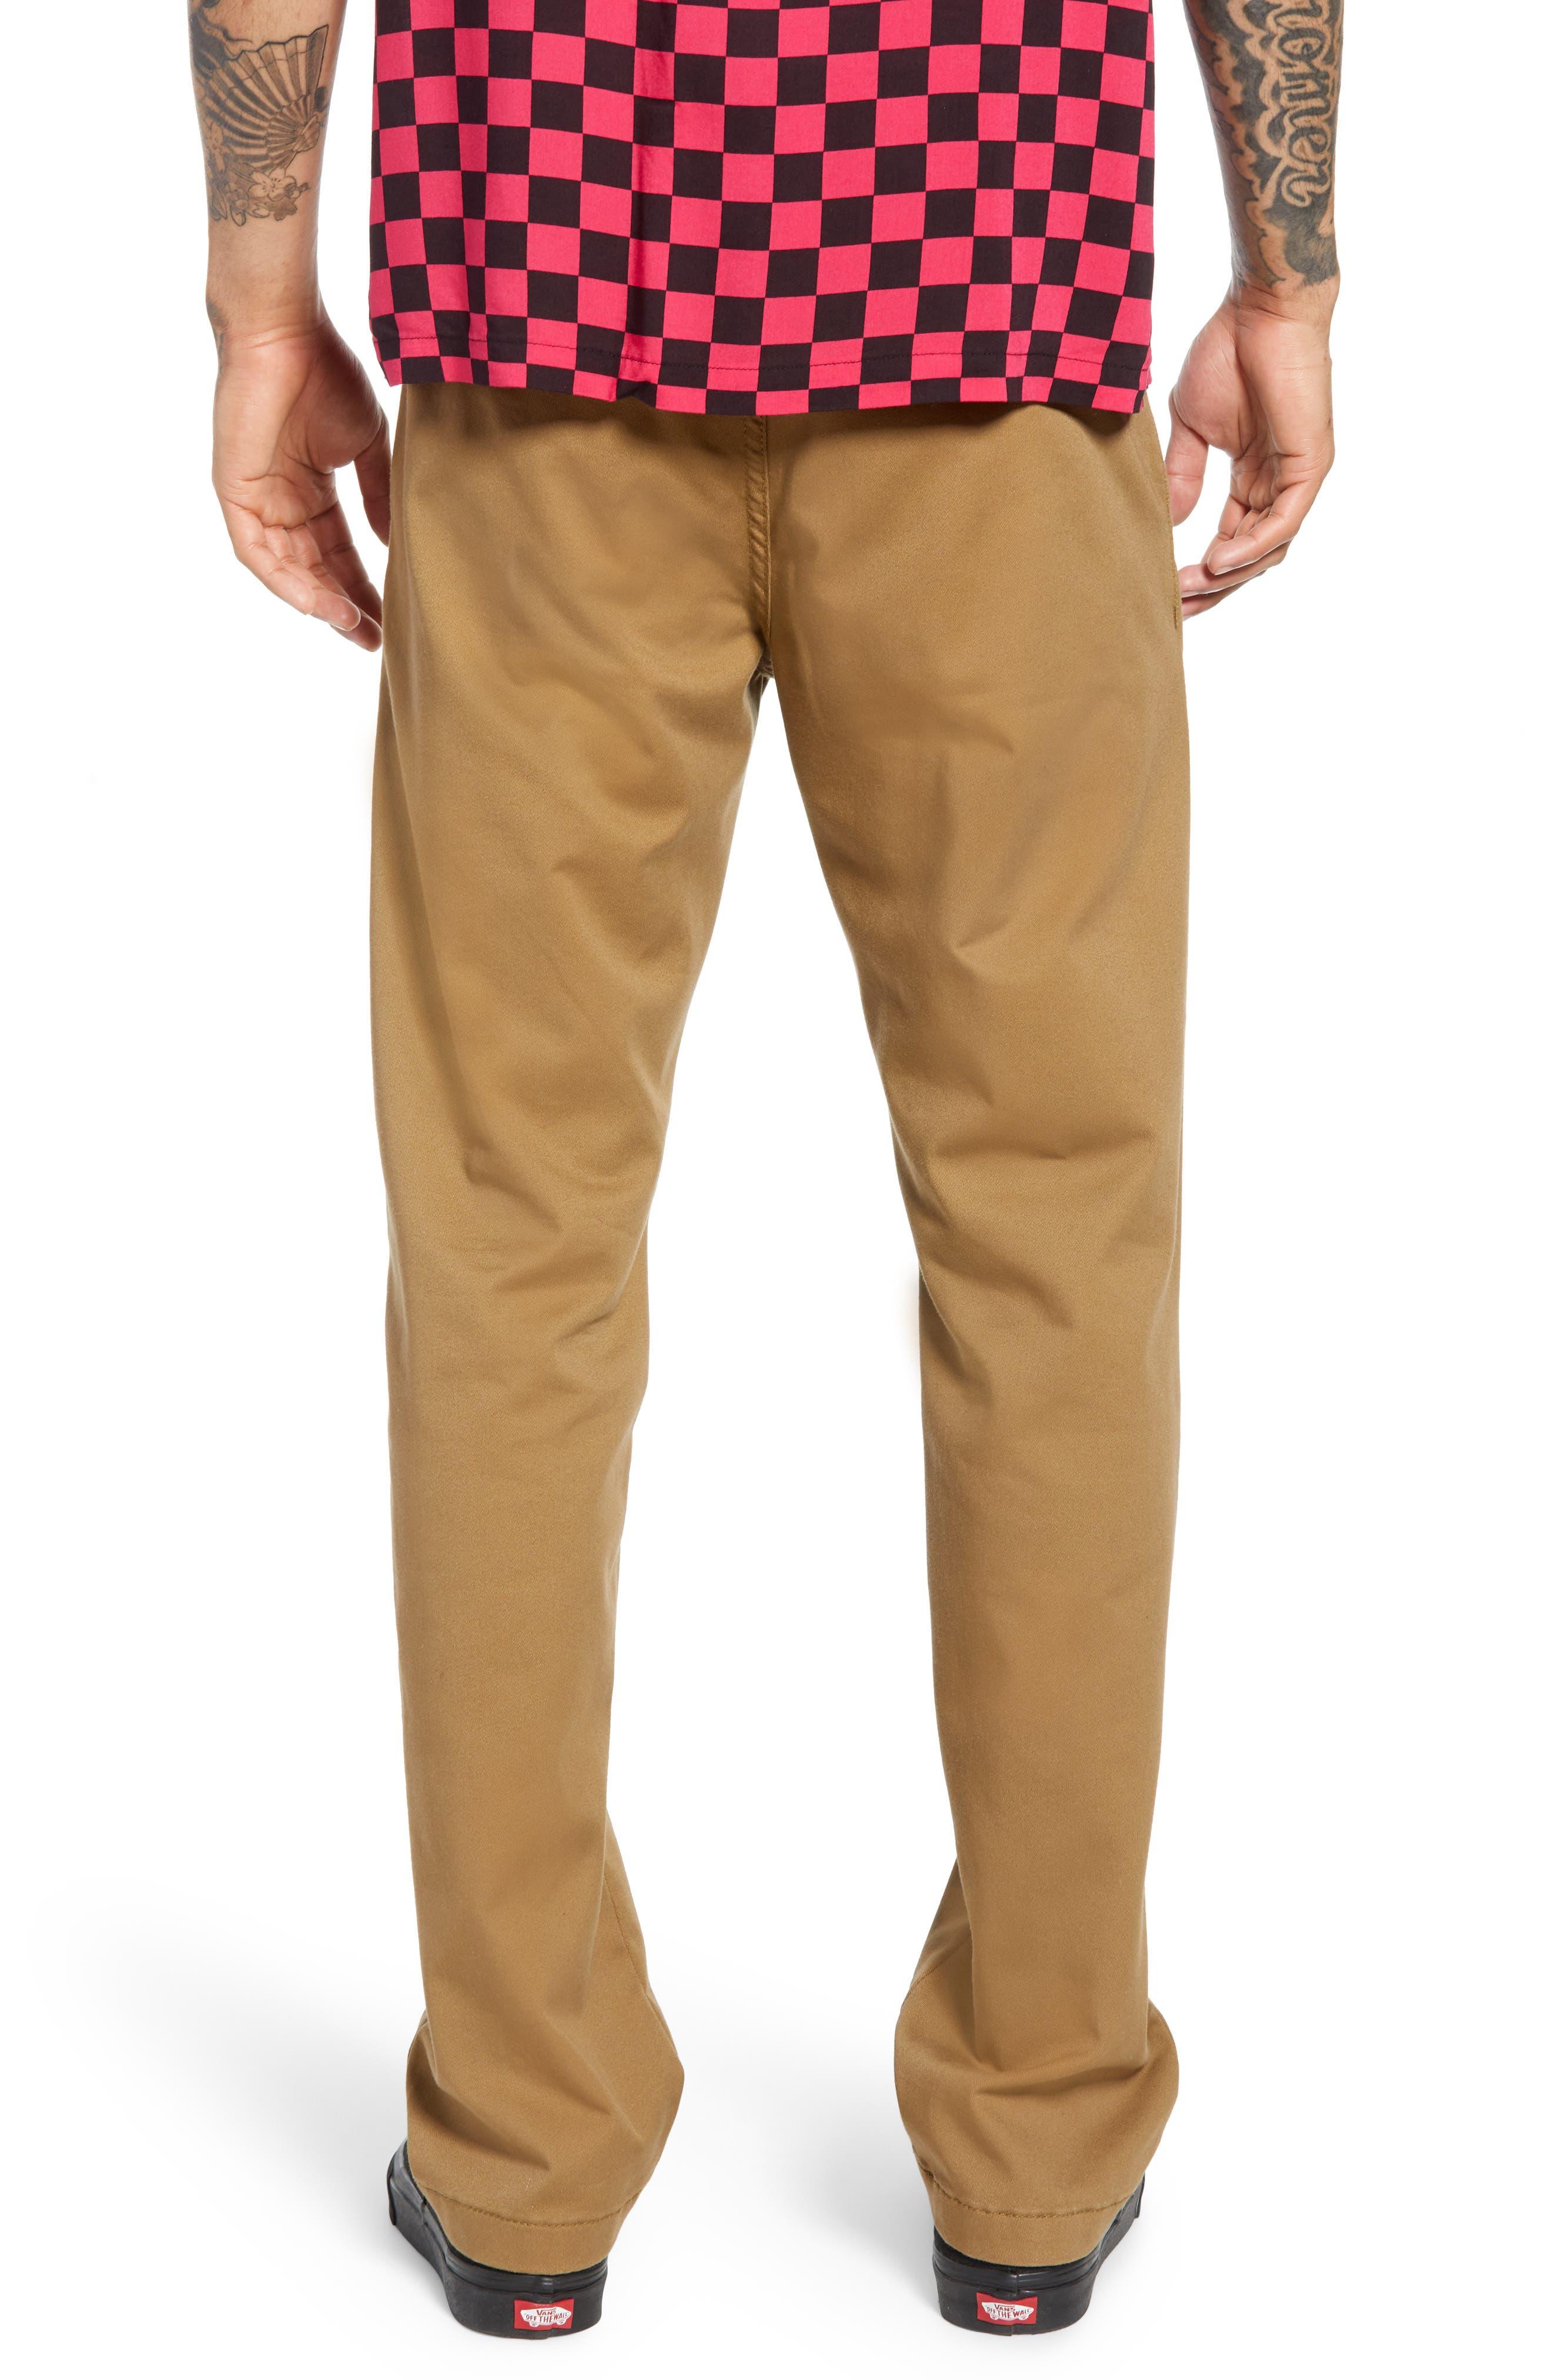 b6c7bc0ff9 Men s Vans Pants